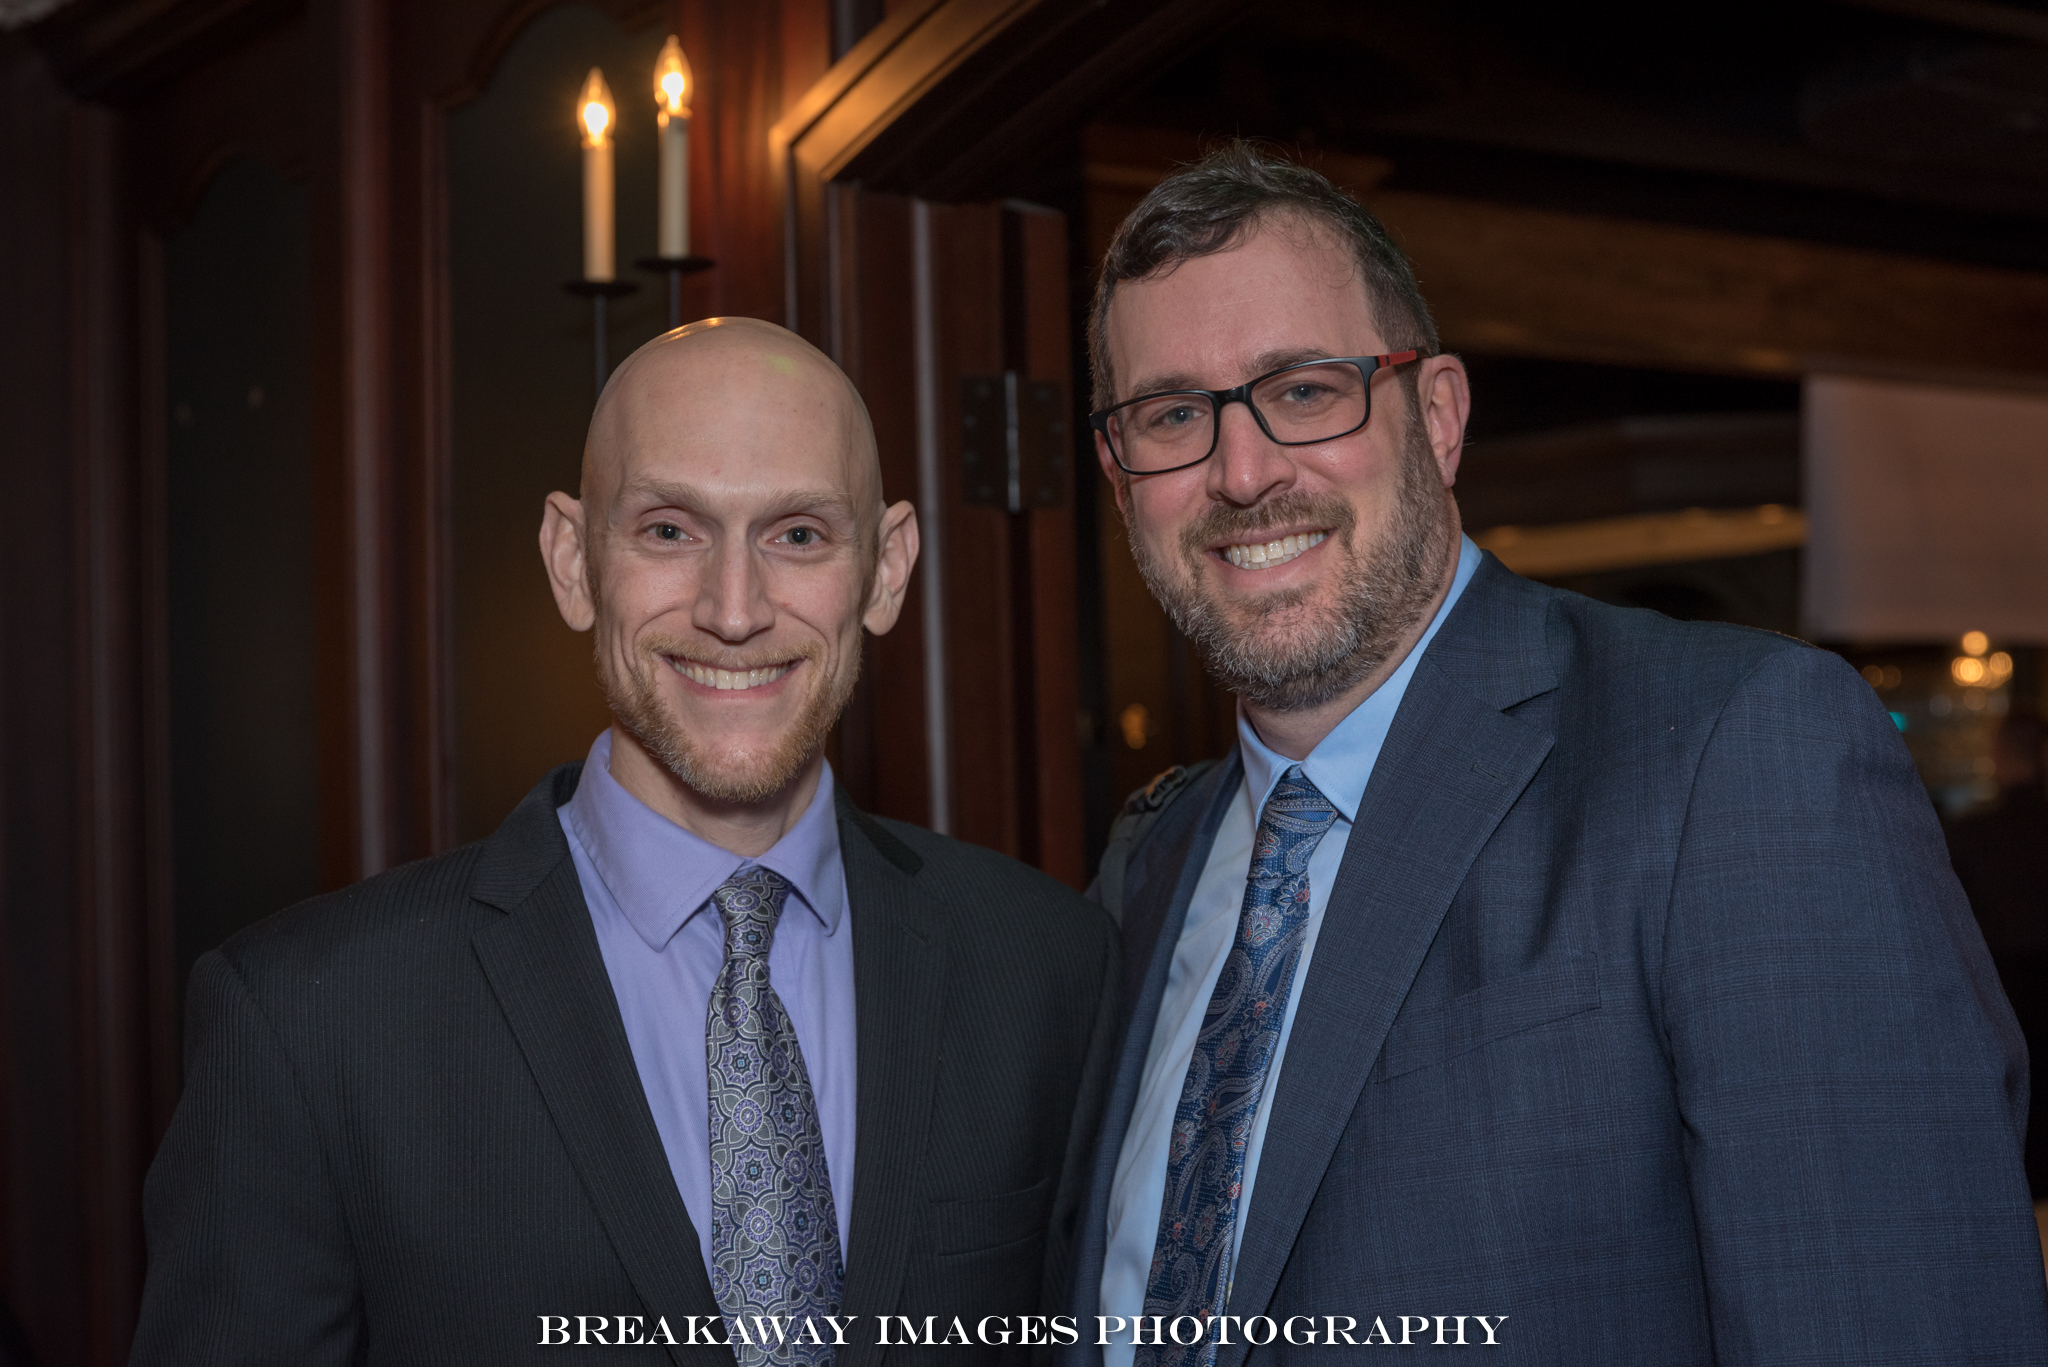 Matthew Levithan Bar Mitzvah 2019-01-19 v-115.jpg